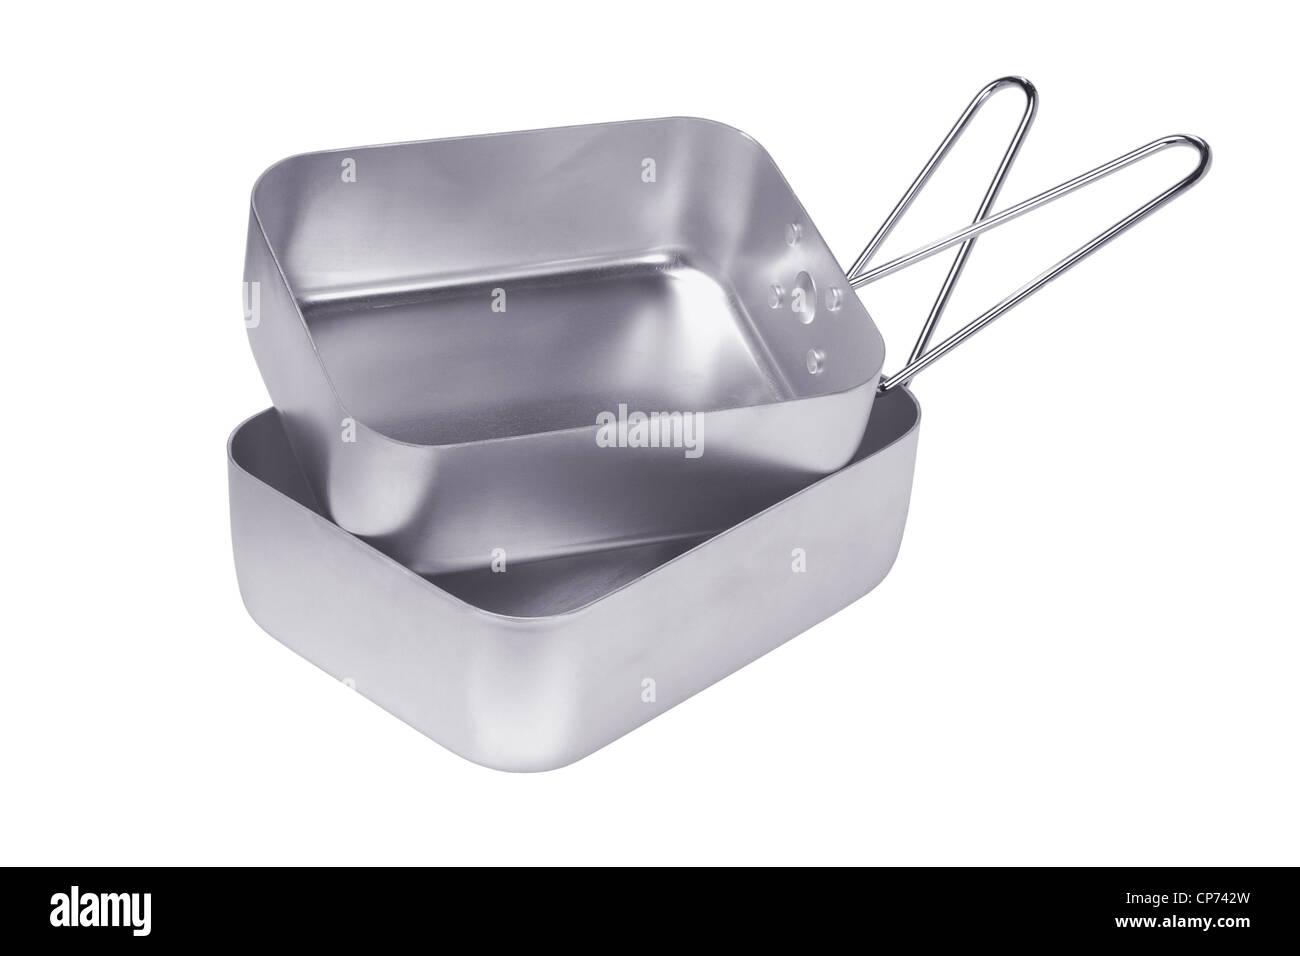 Aluminum Mess tins on White Background - Stock Image